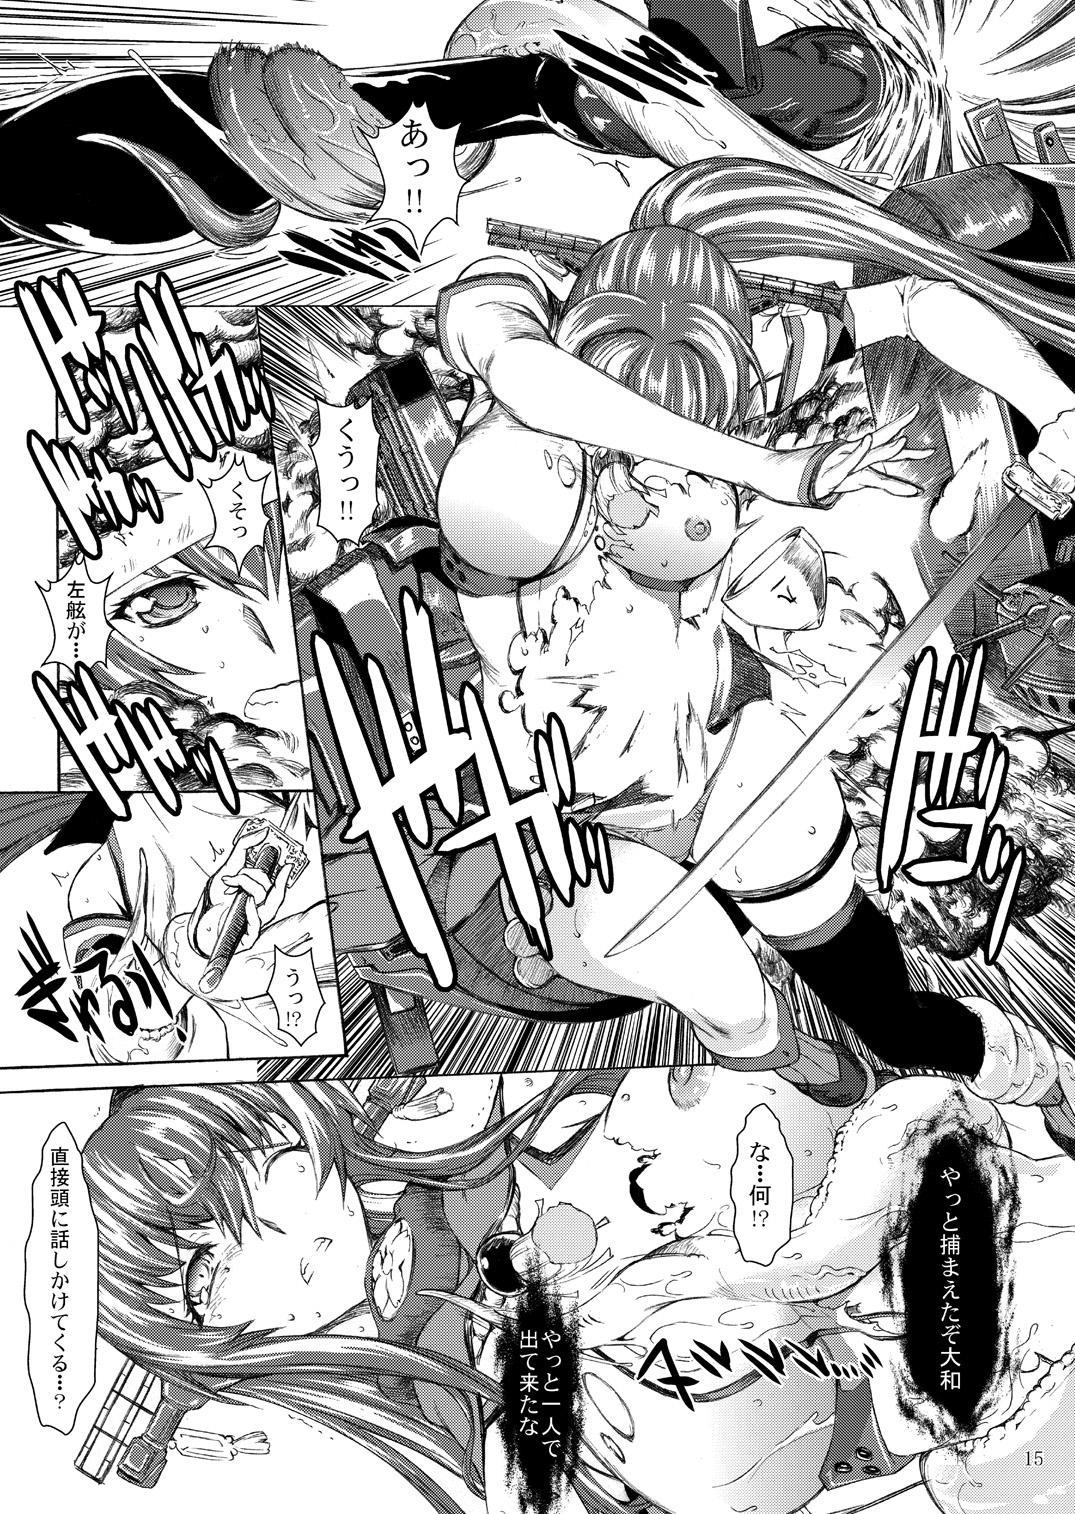 Yamato Shisu 1 15